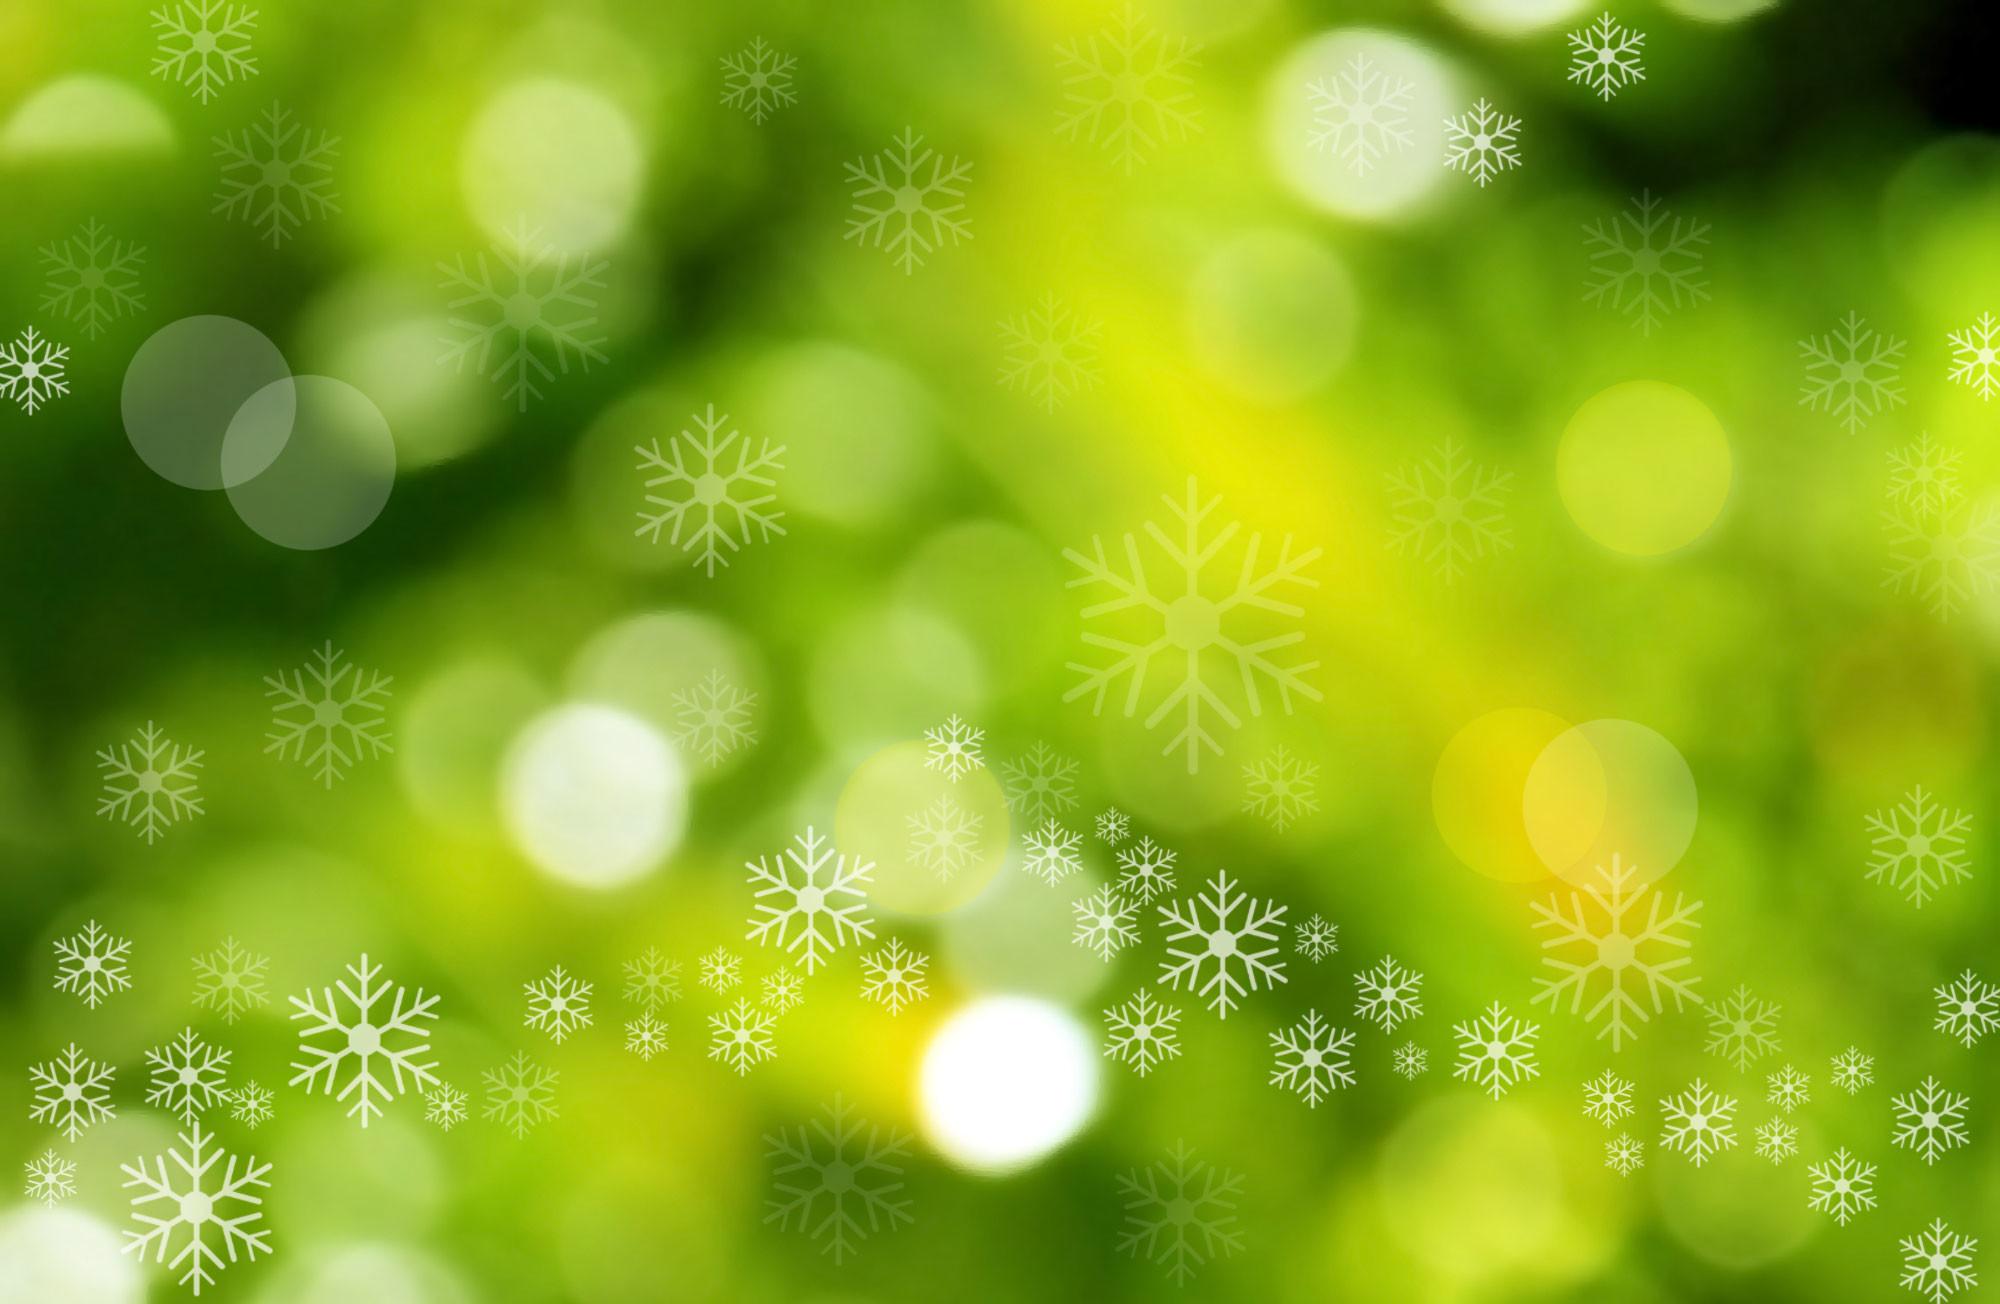 Light Green Christmas Background (09)